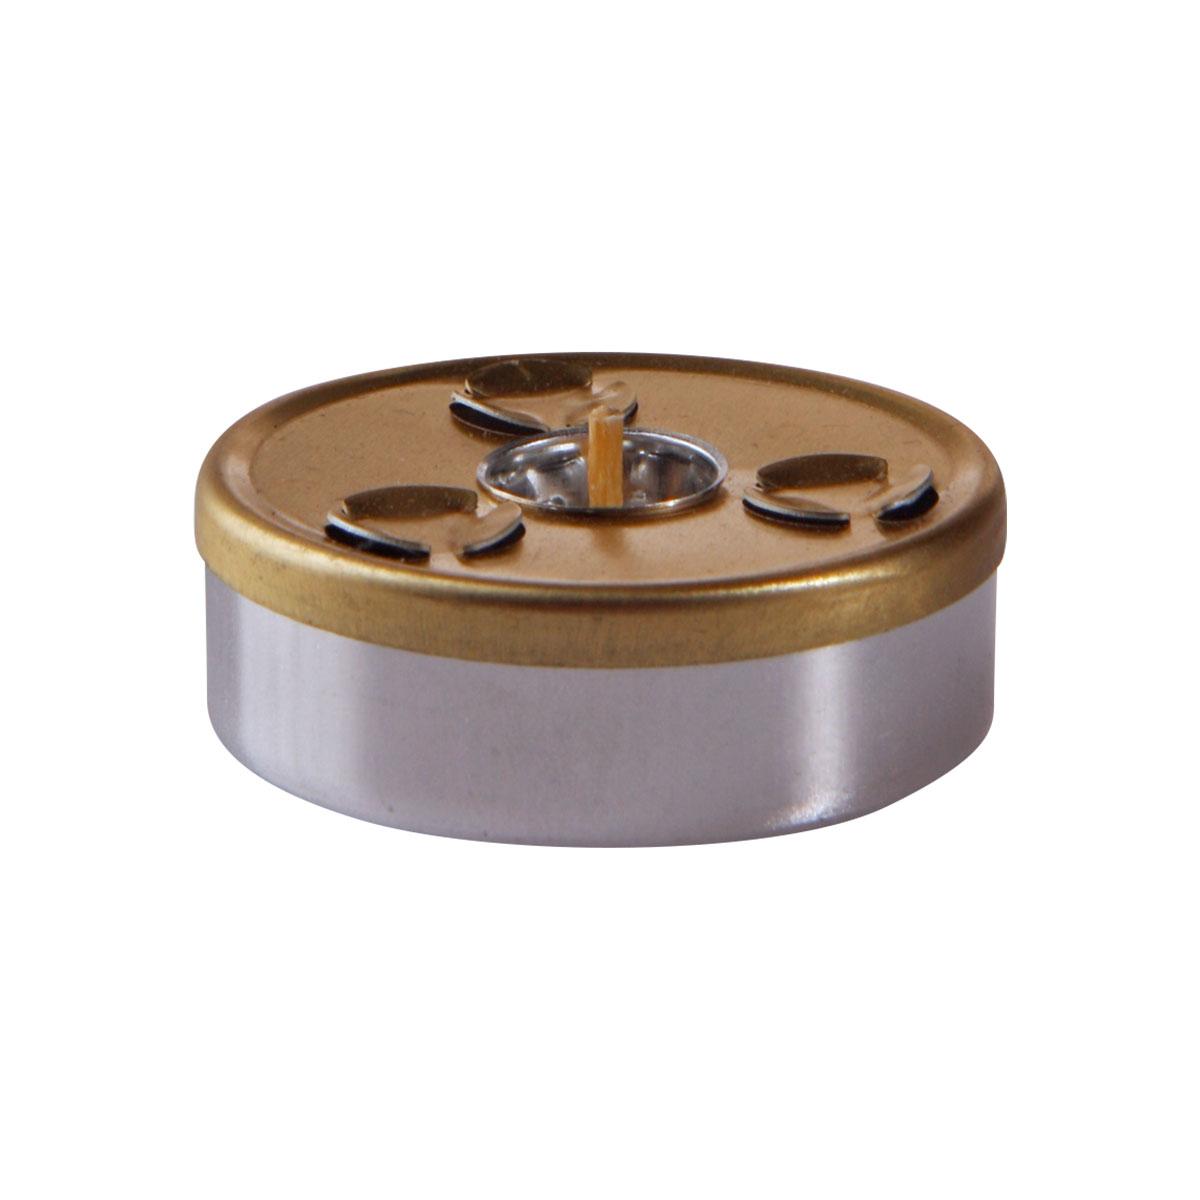 Maxi-Teelicht messing (2 Kugeln) – (VK-Set)-0